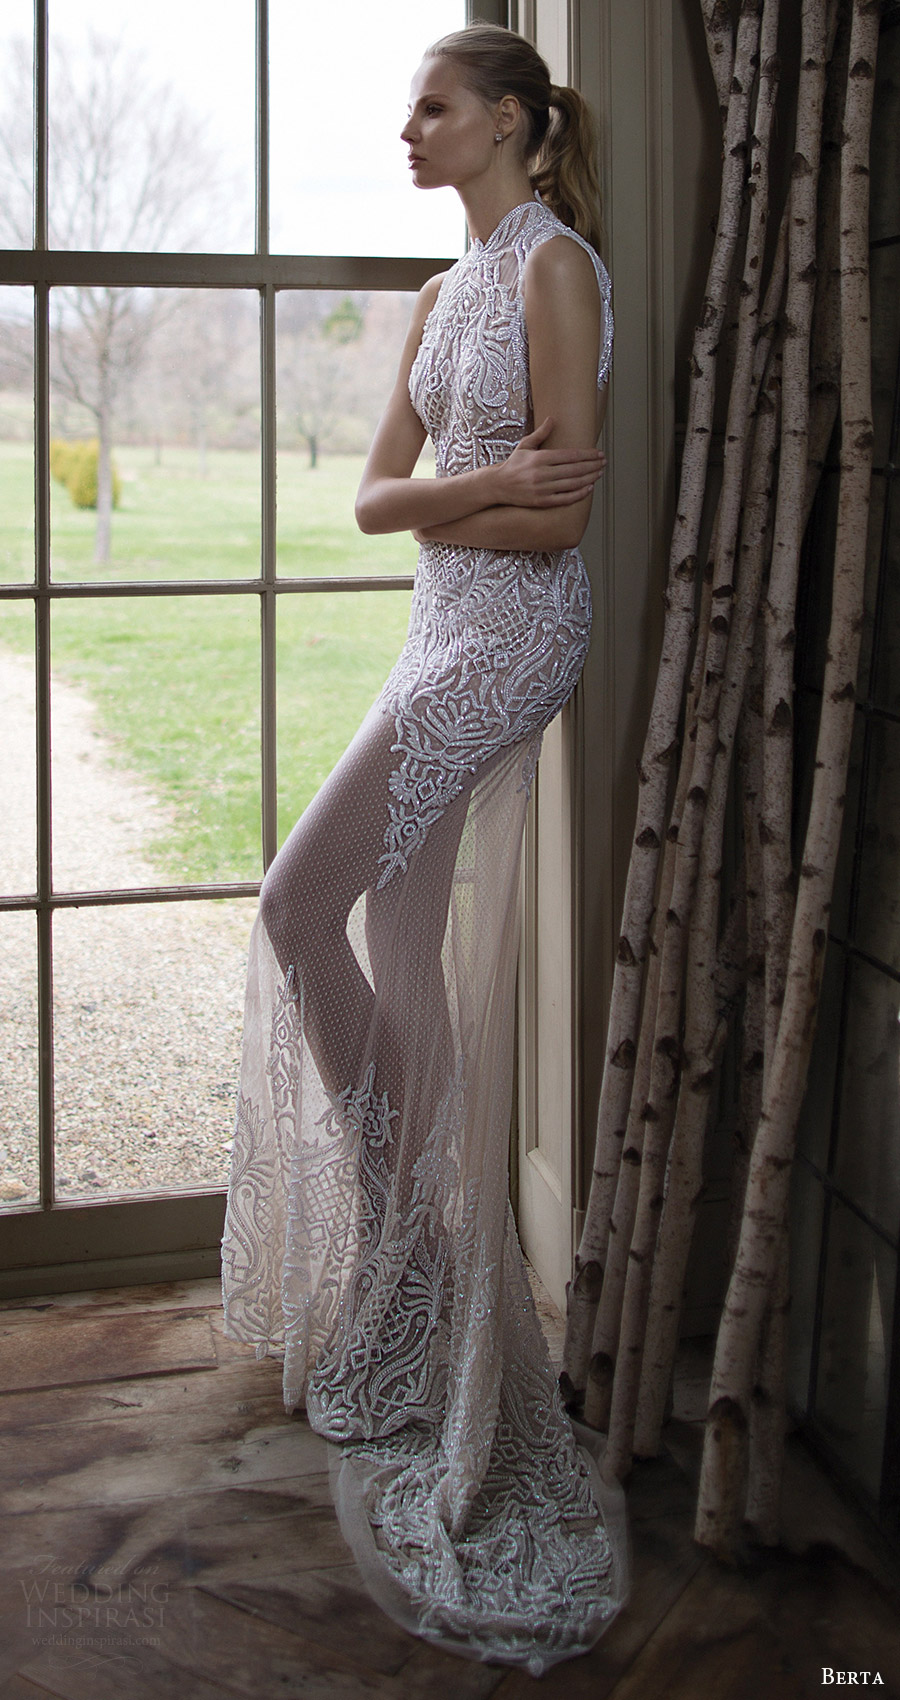 berta bridal fall 2016 sleeveless high neck trumpet wedding dress (16 116) sv long train